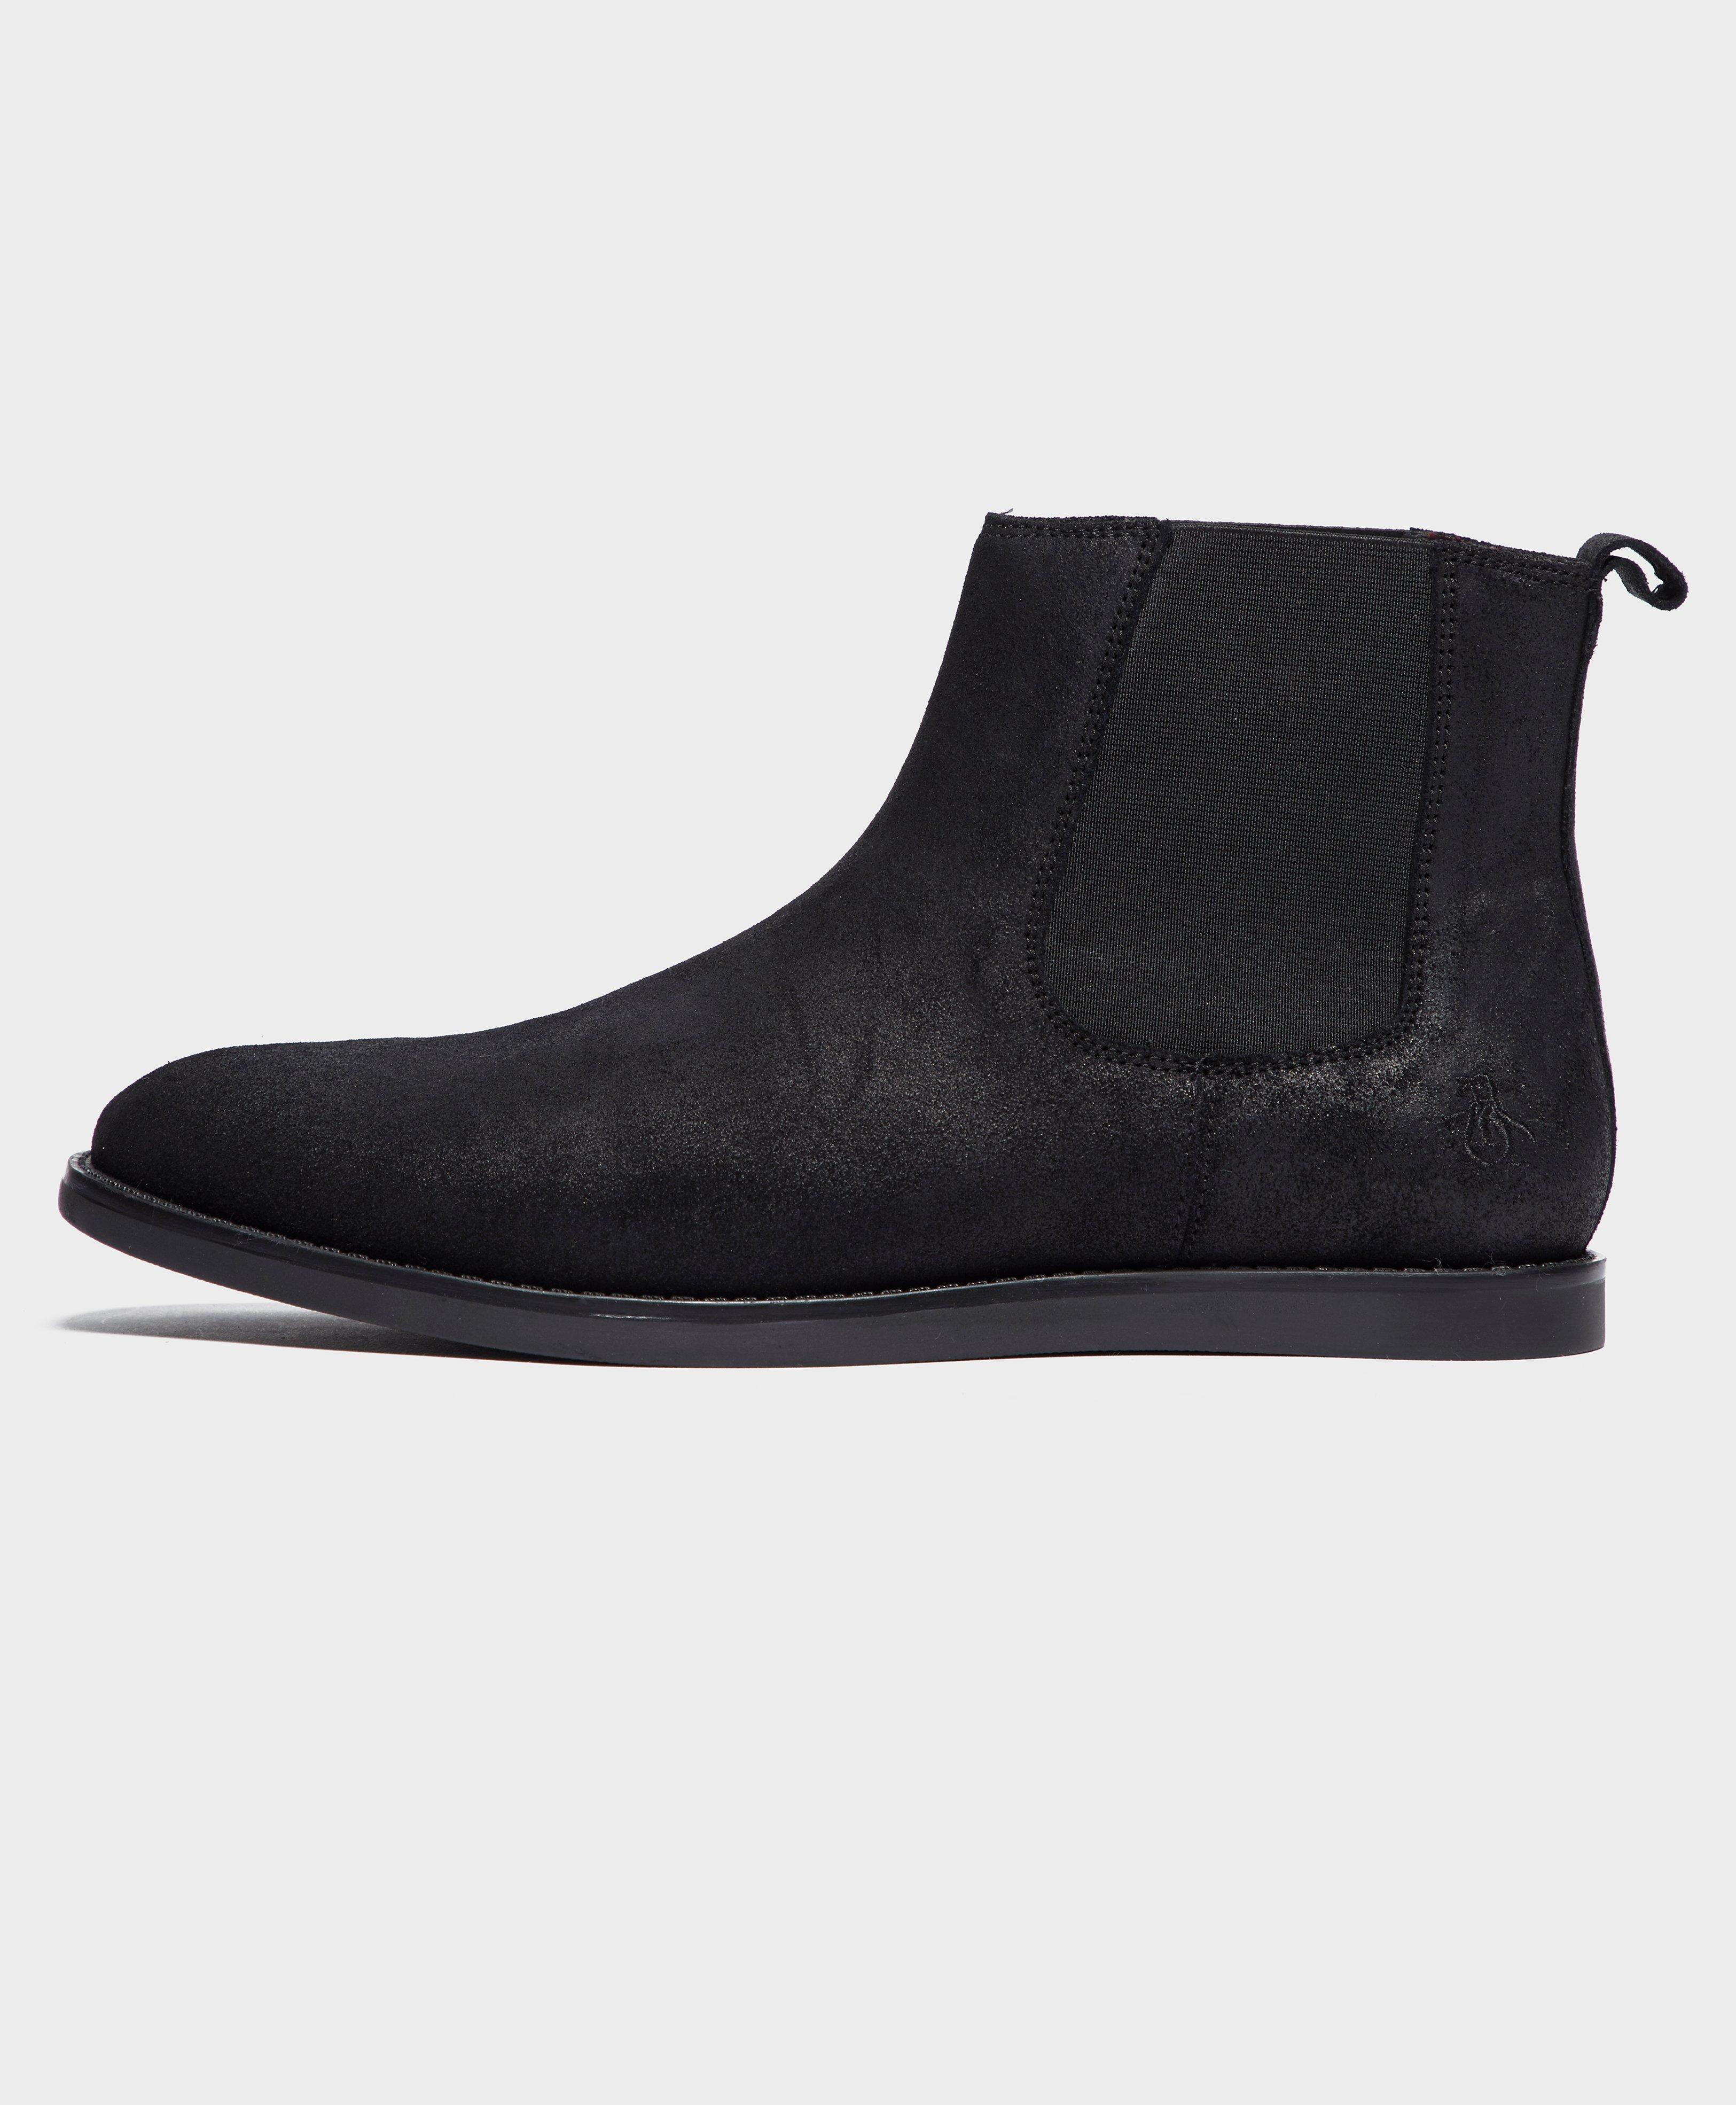 Original Penguin London Chelsea Boots In Black